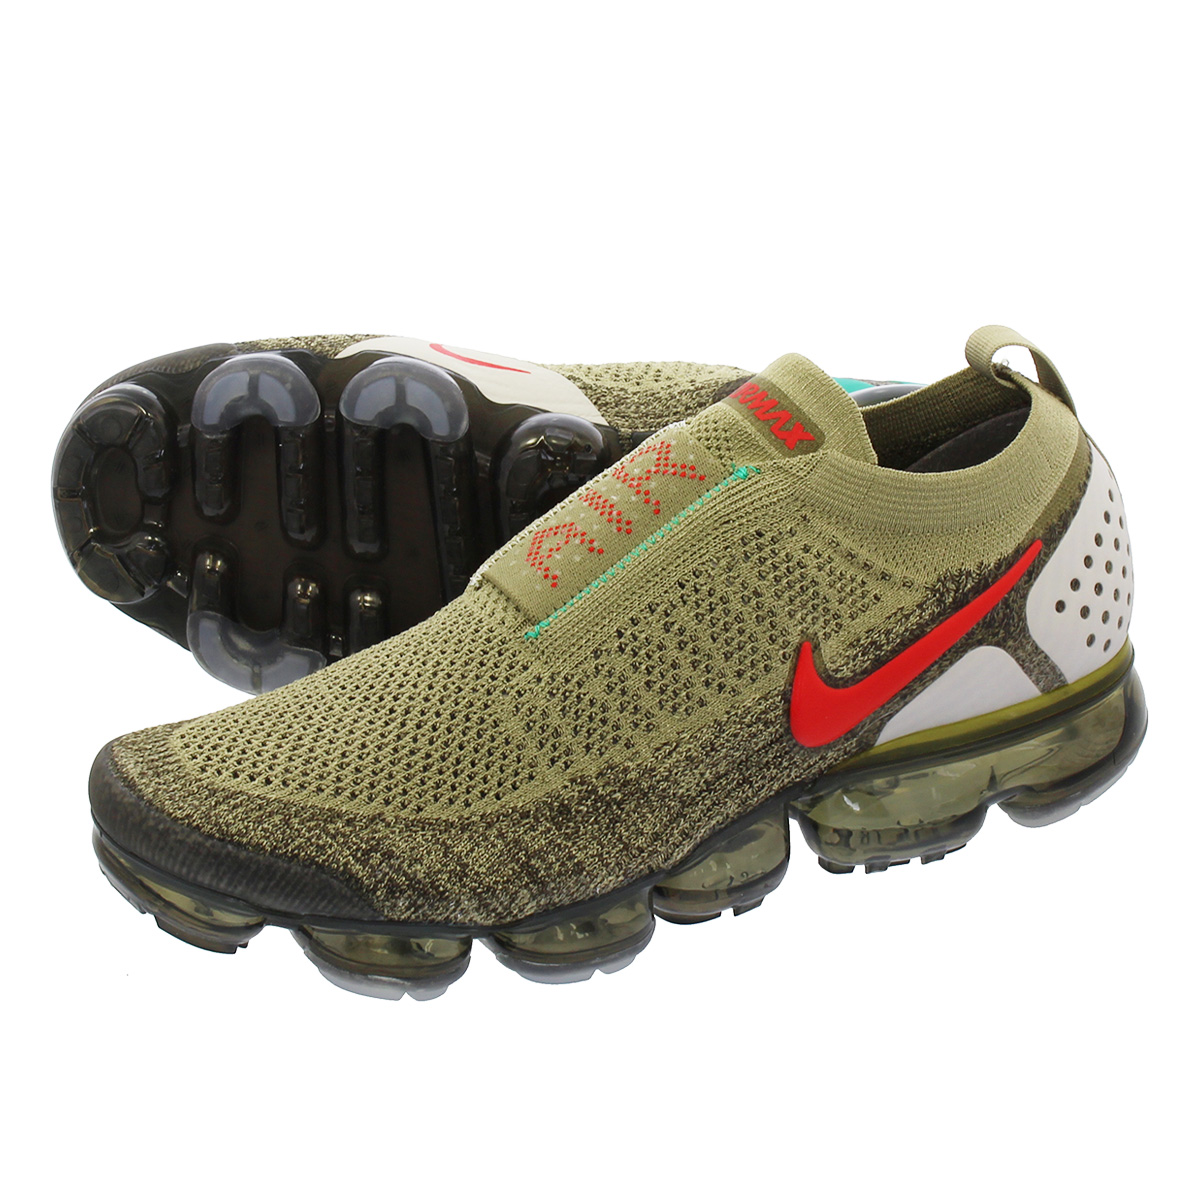 LOWTEX PLUS  NIKE AIR VAPORMAX MOC 2 Nike air vapor max fried food knit  mock 2 NEUTRAL OLIVE HABANERO RED ah7006-200  c4e3b6017